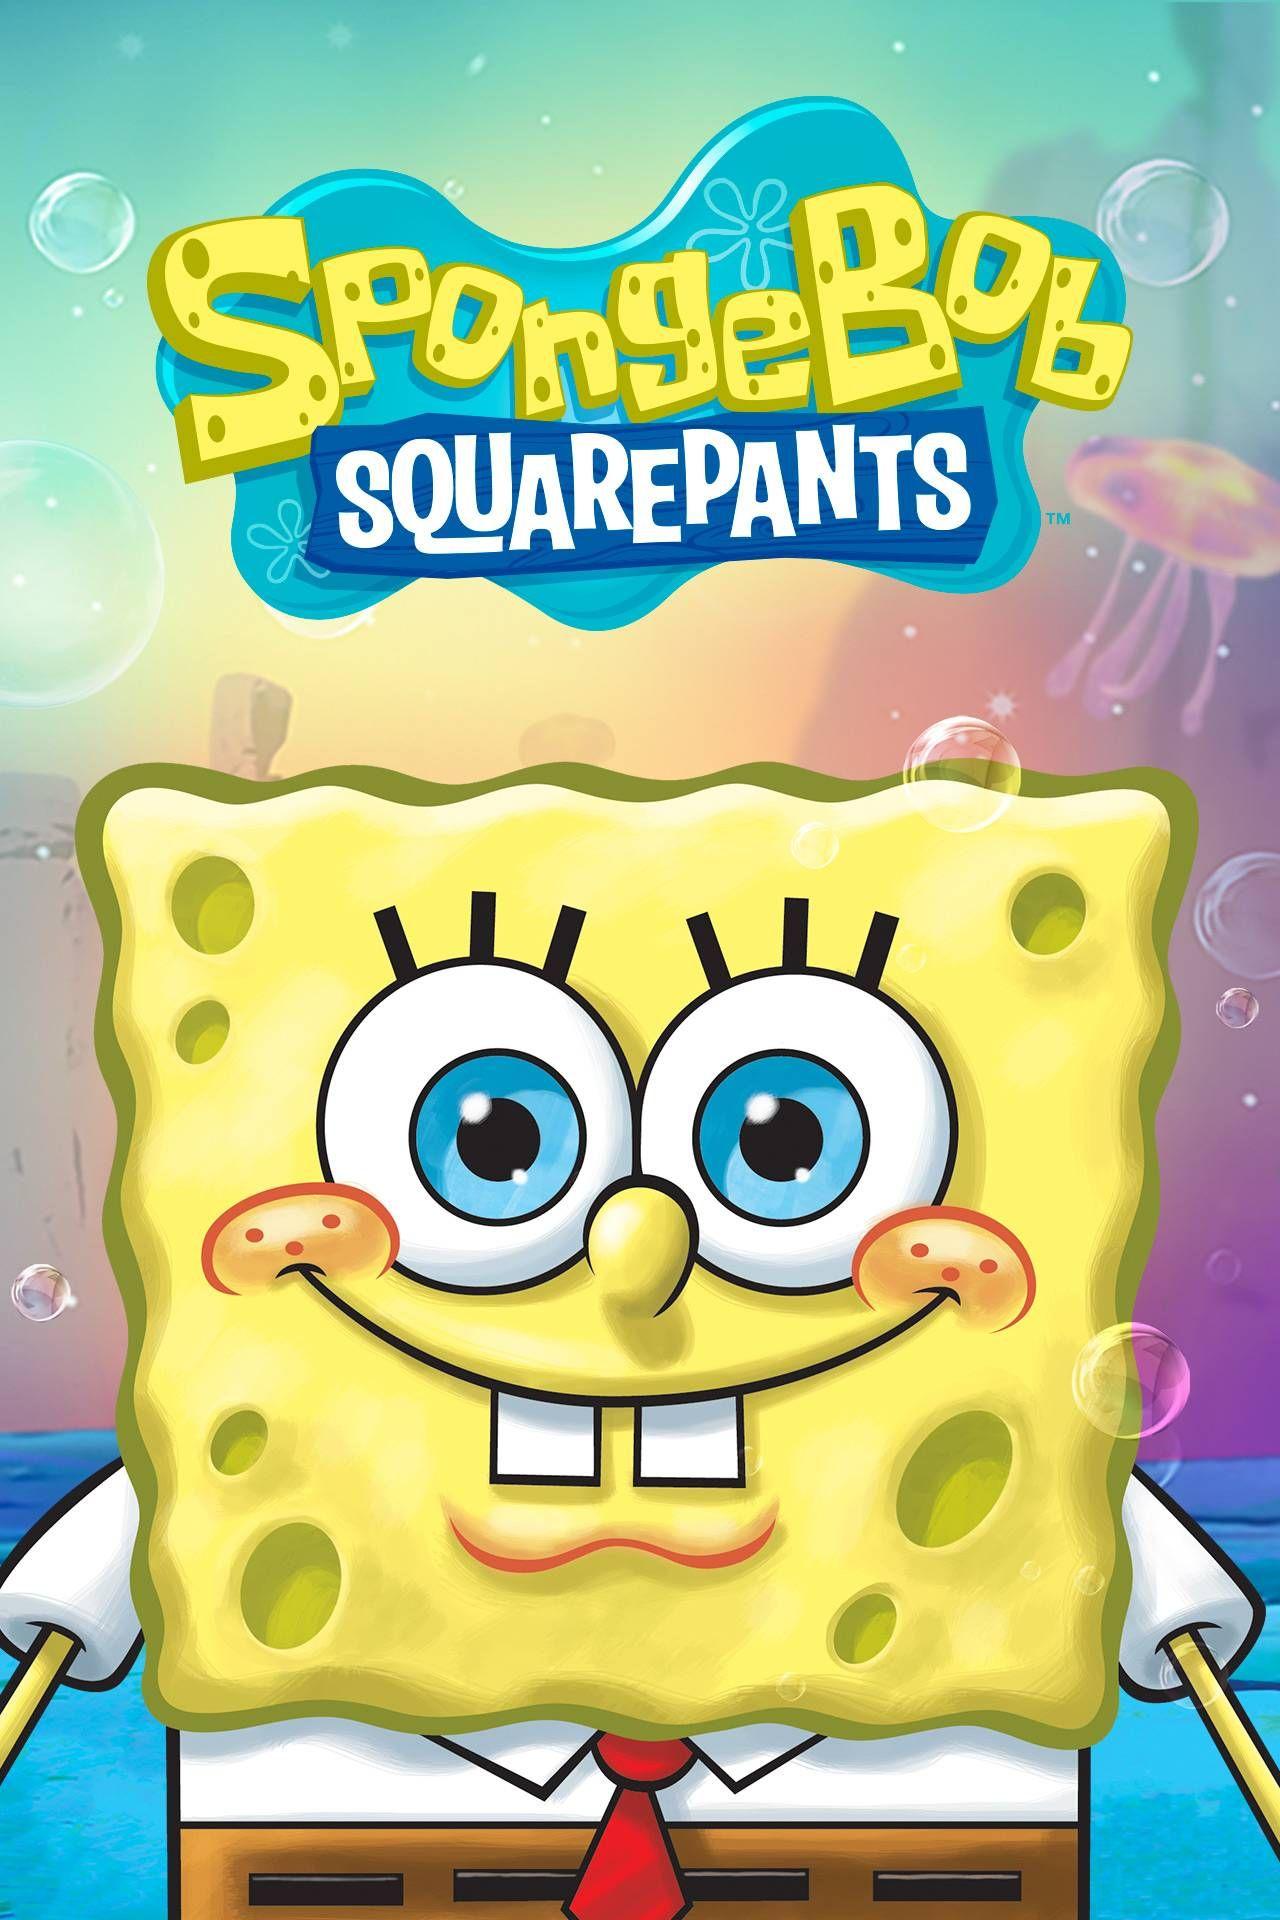 Nickelodeon 2020 : nickelodeon, Nickelodeon's, 2020-21, Content, Here!, @Nickelodeon, #Nickelodeon, Nickelodeon, Shows,, Spongebob,, Spongebob, Squarepants